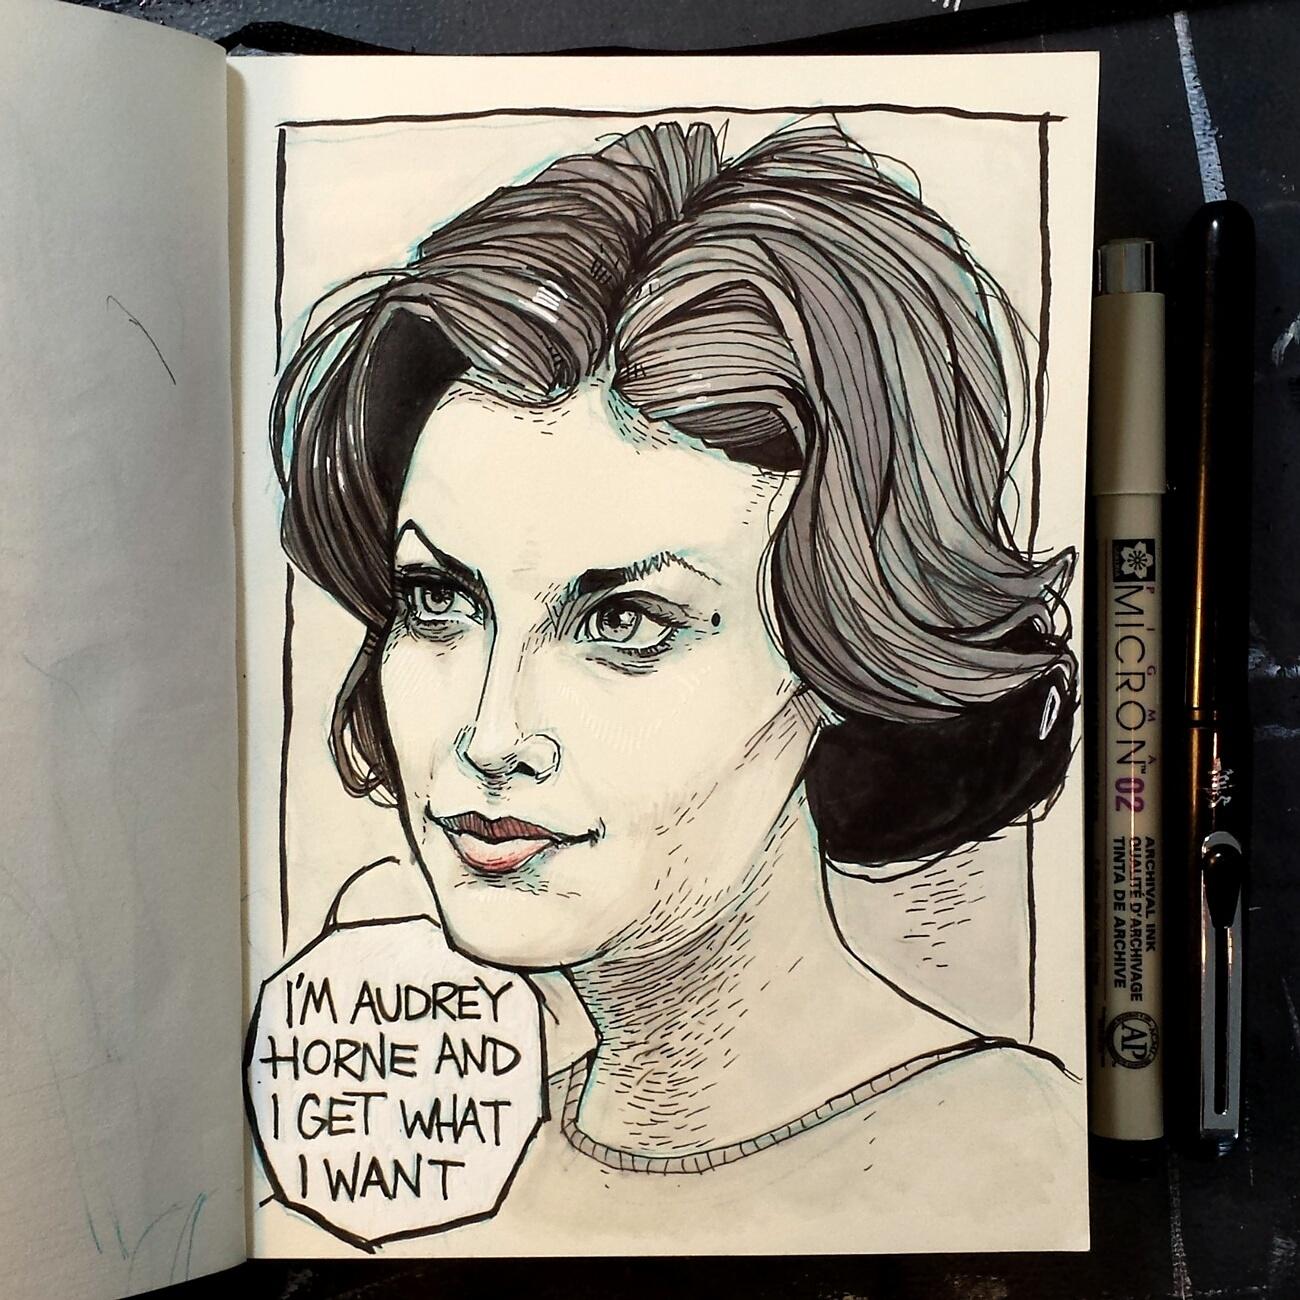 Sherilyn Fenn as Audrey Horne drawing